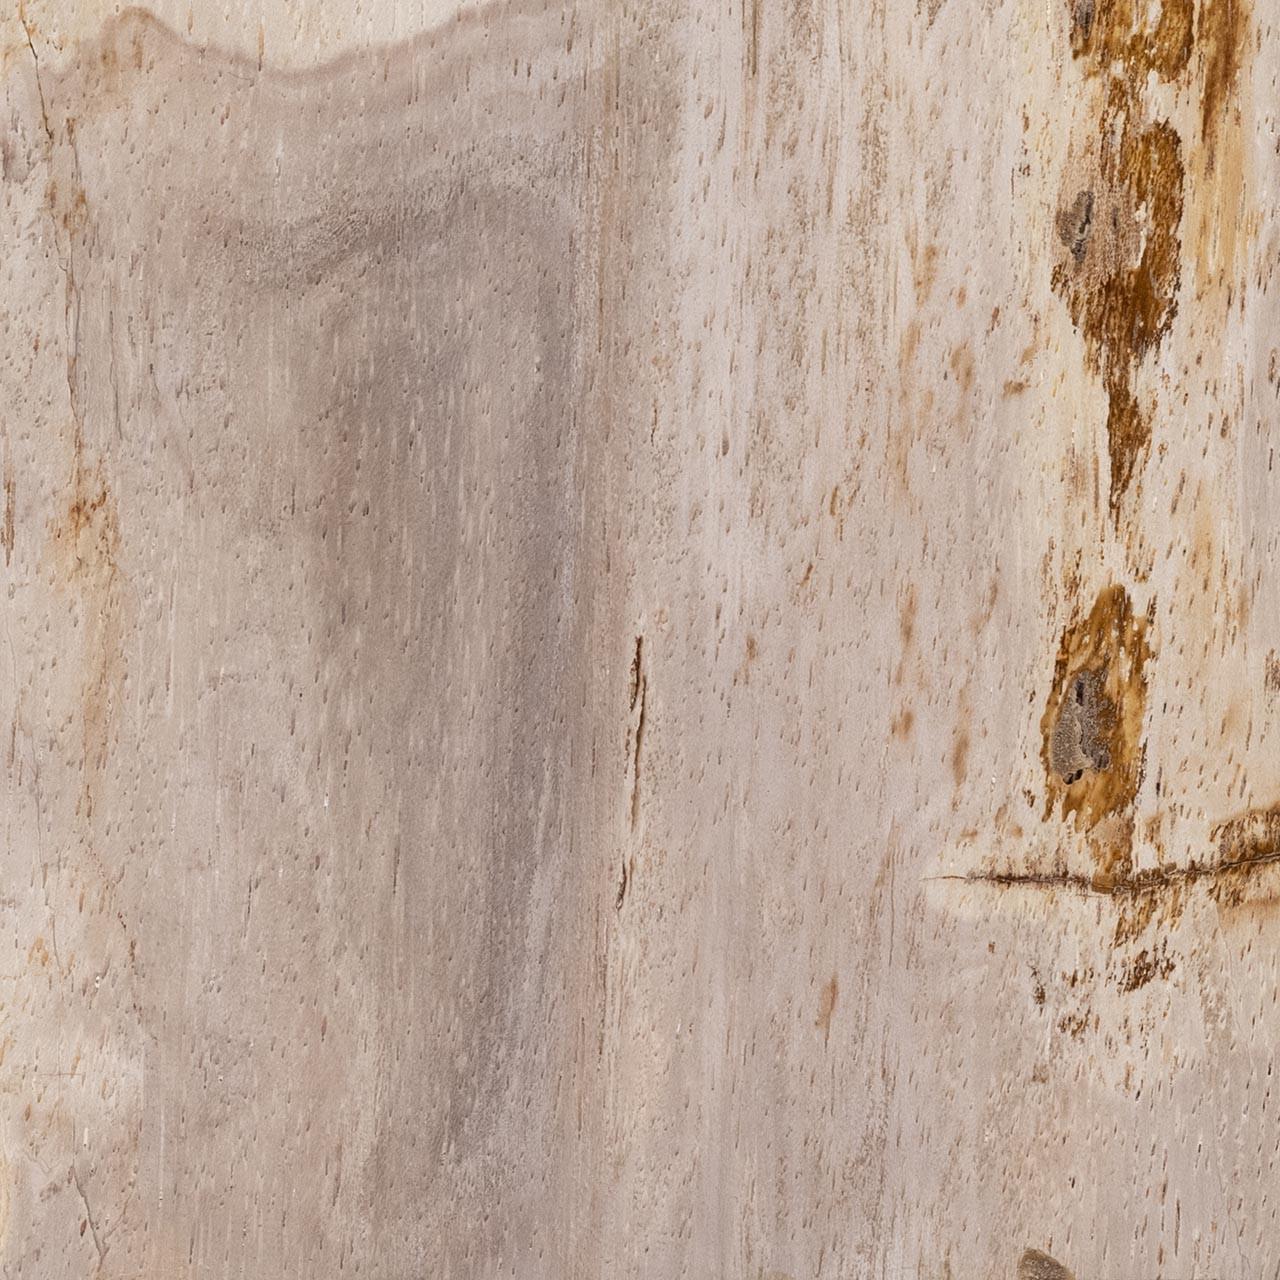 Glens End Table - Light Petrified Wood